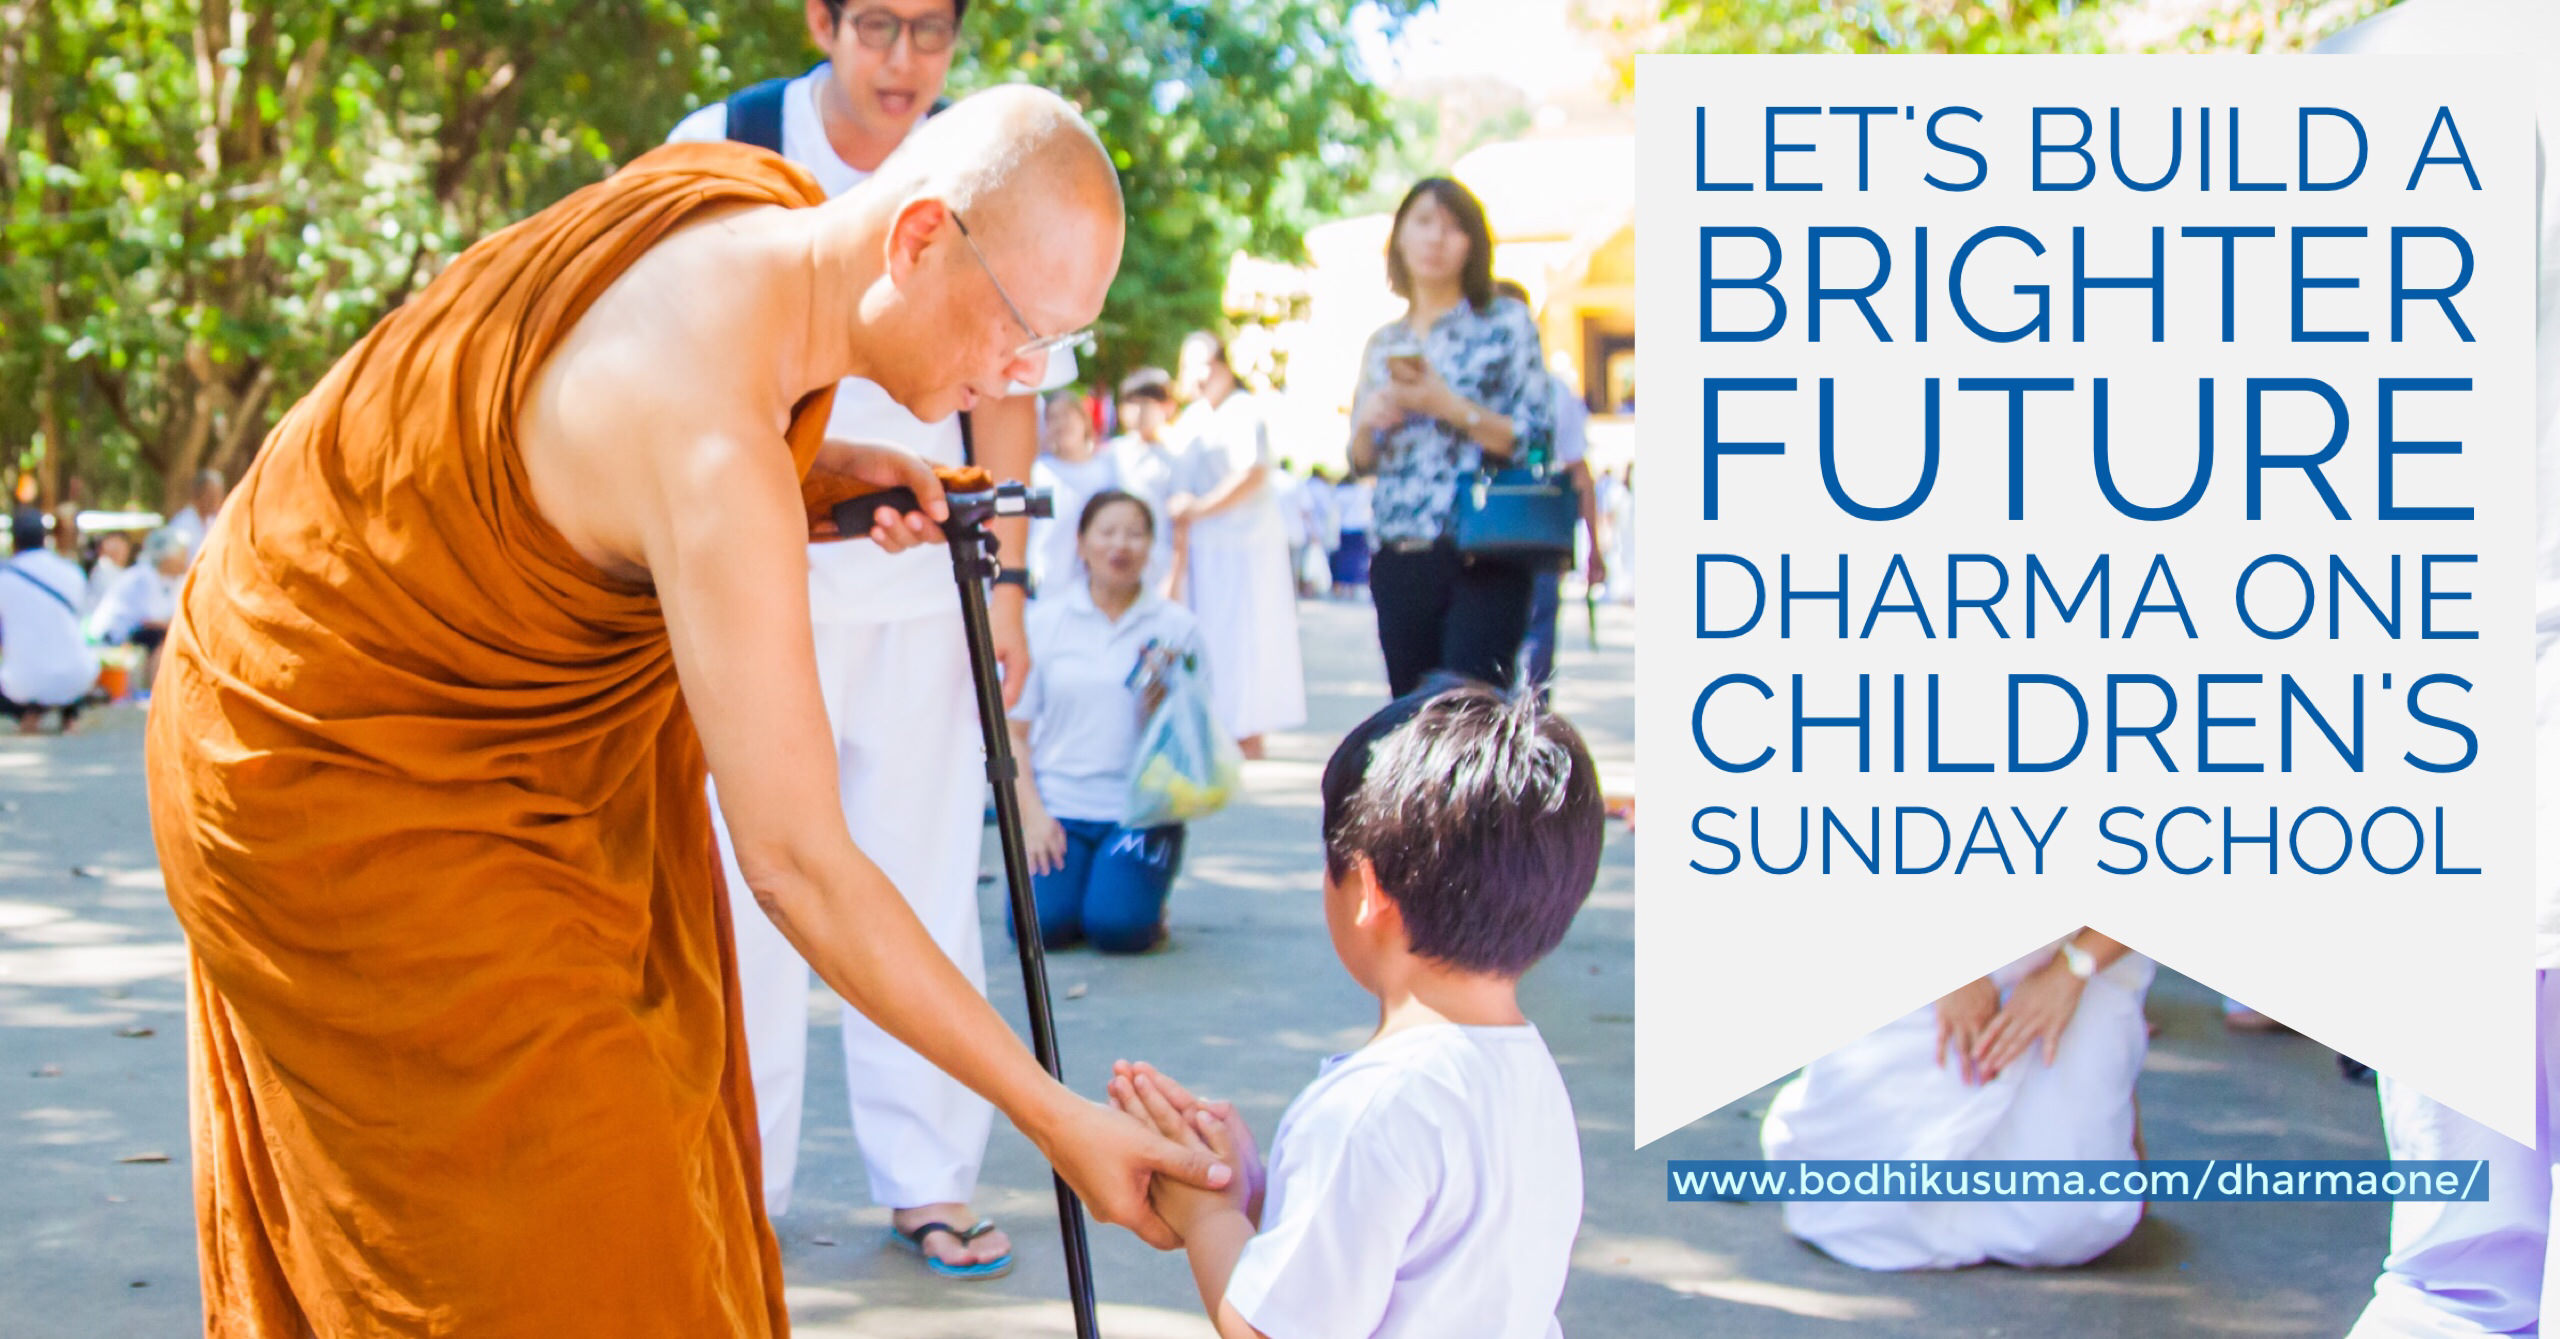 Dharma One Children's Sunday School